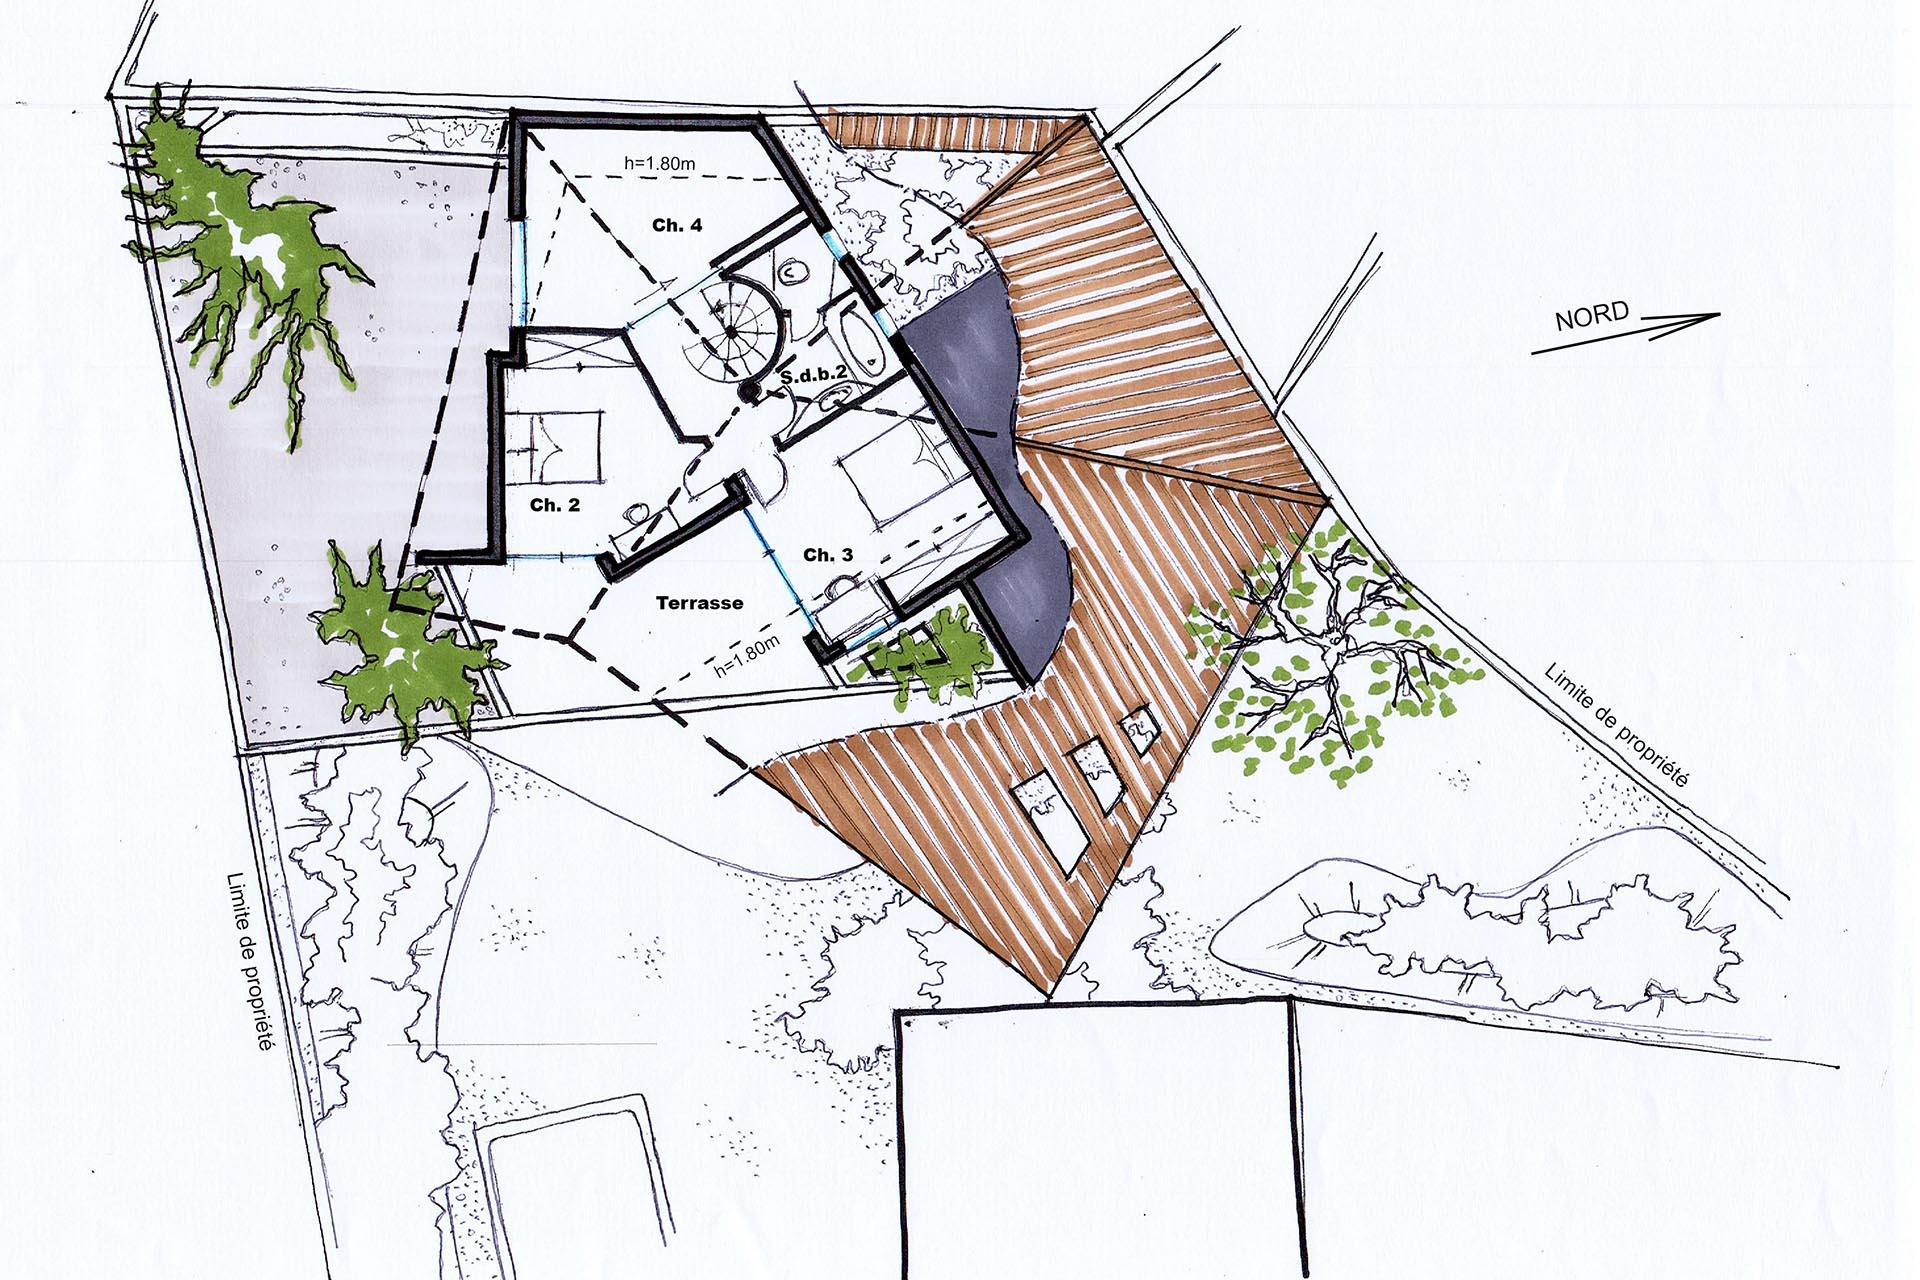 D coration jardin suspendu architecture 37 lyon for Architecture suspendue